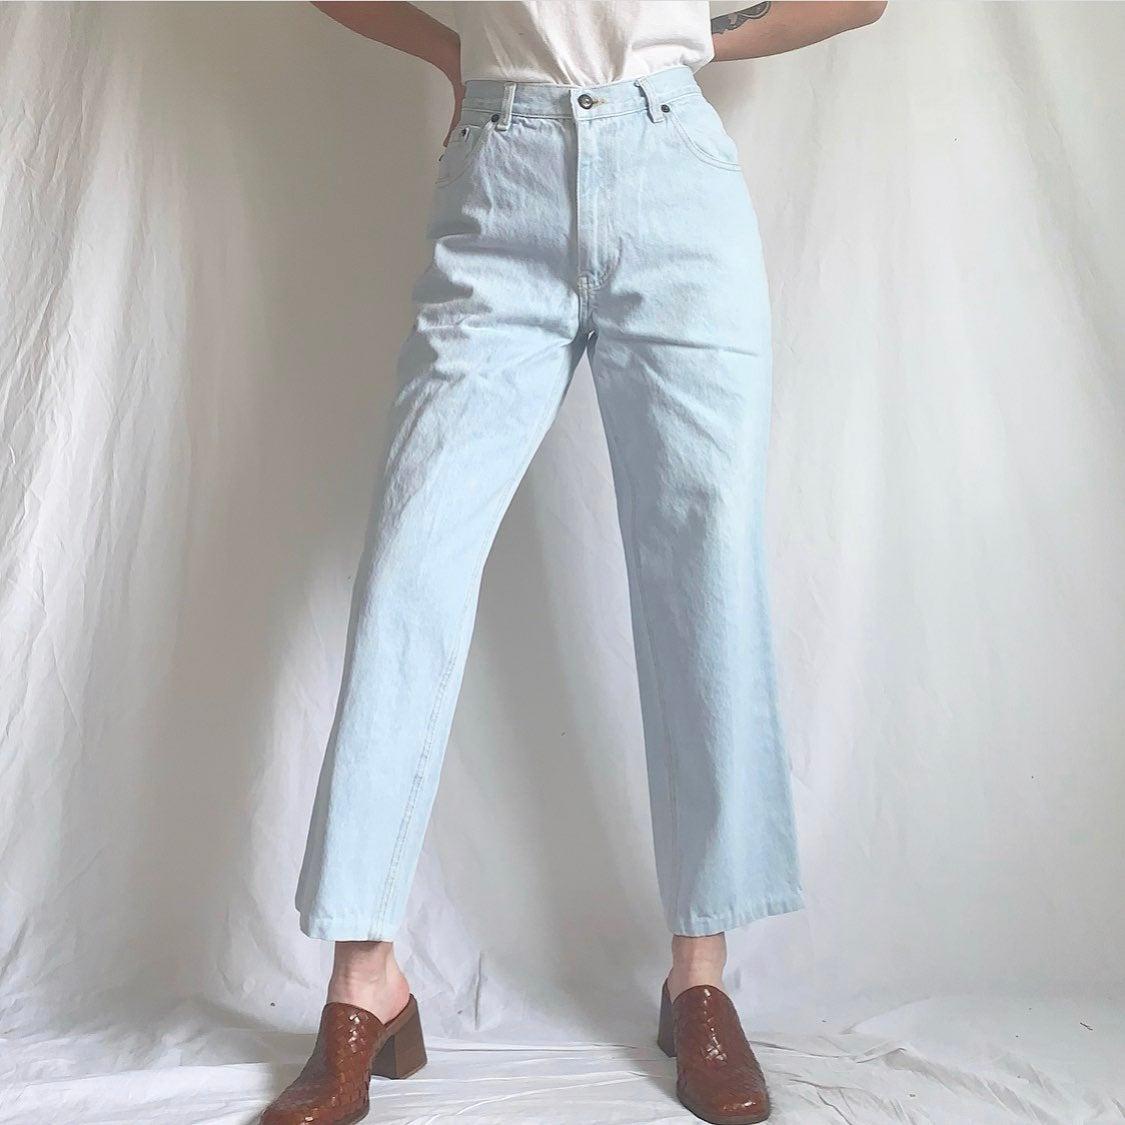 Vintage 90s Bugle Boy Light Wash Jeans